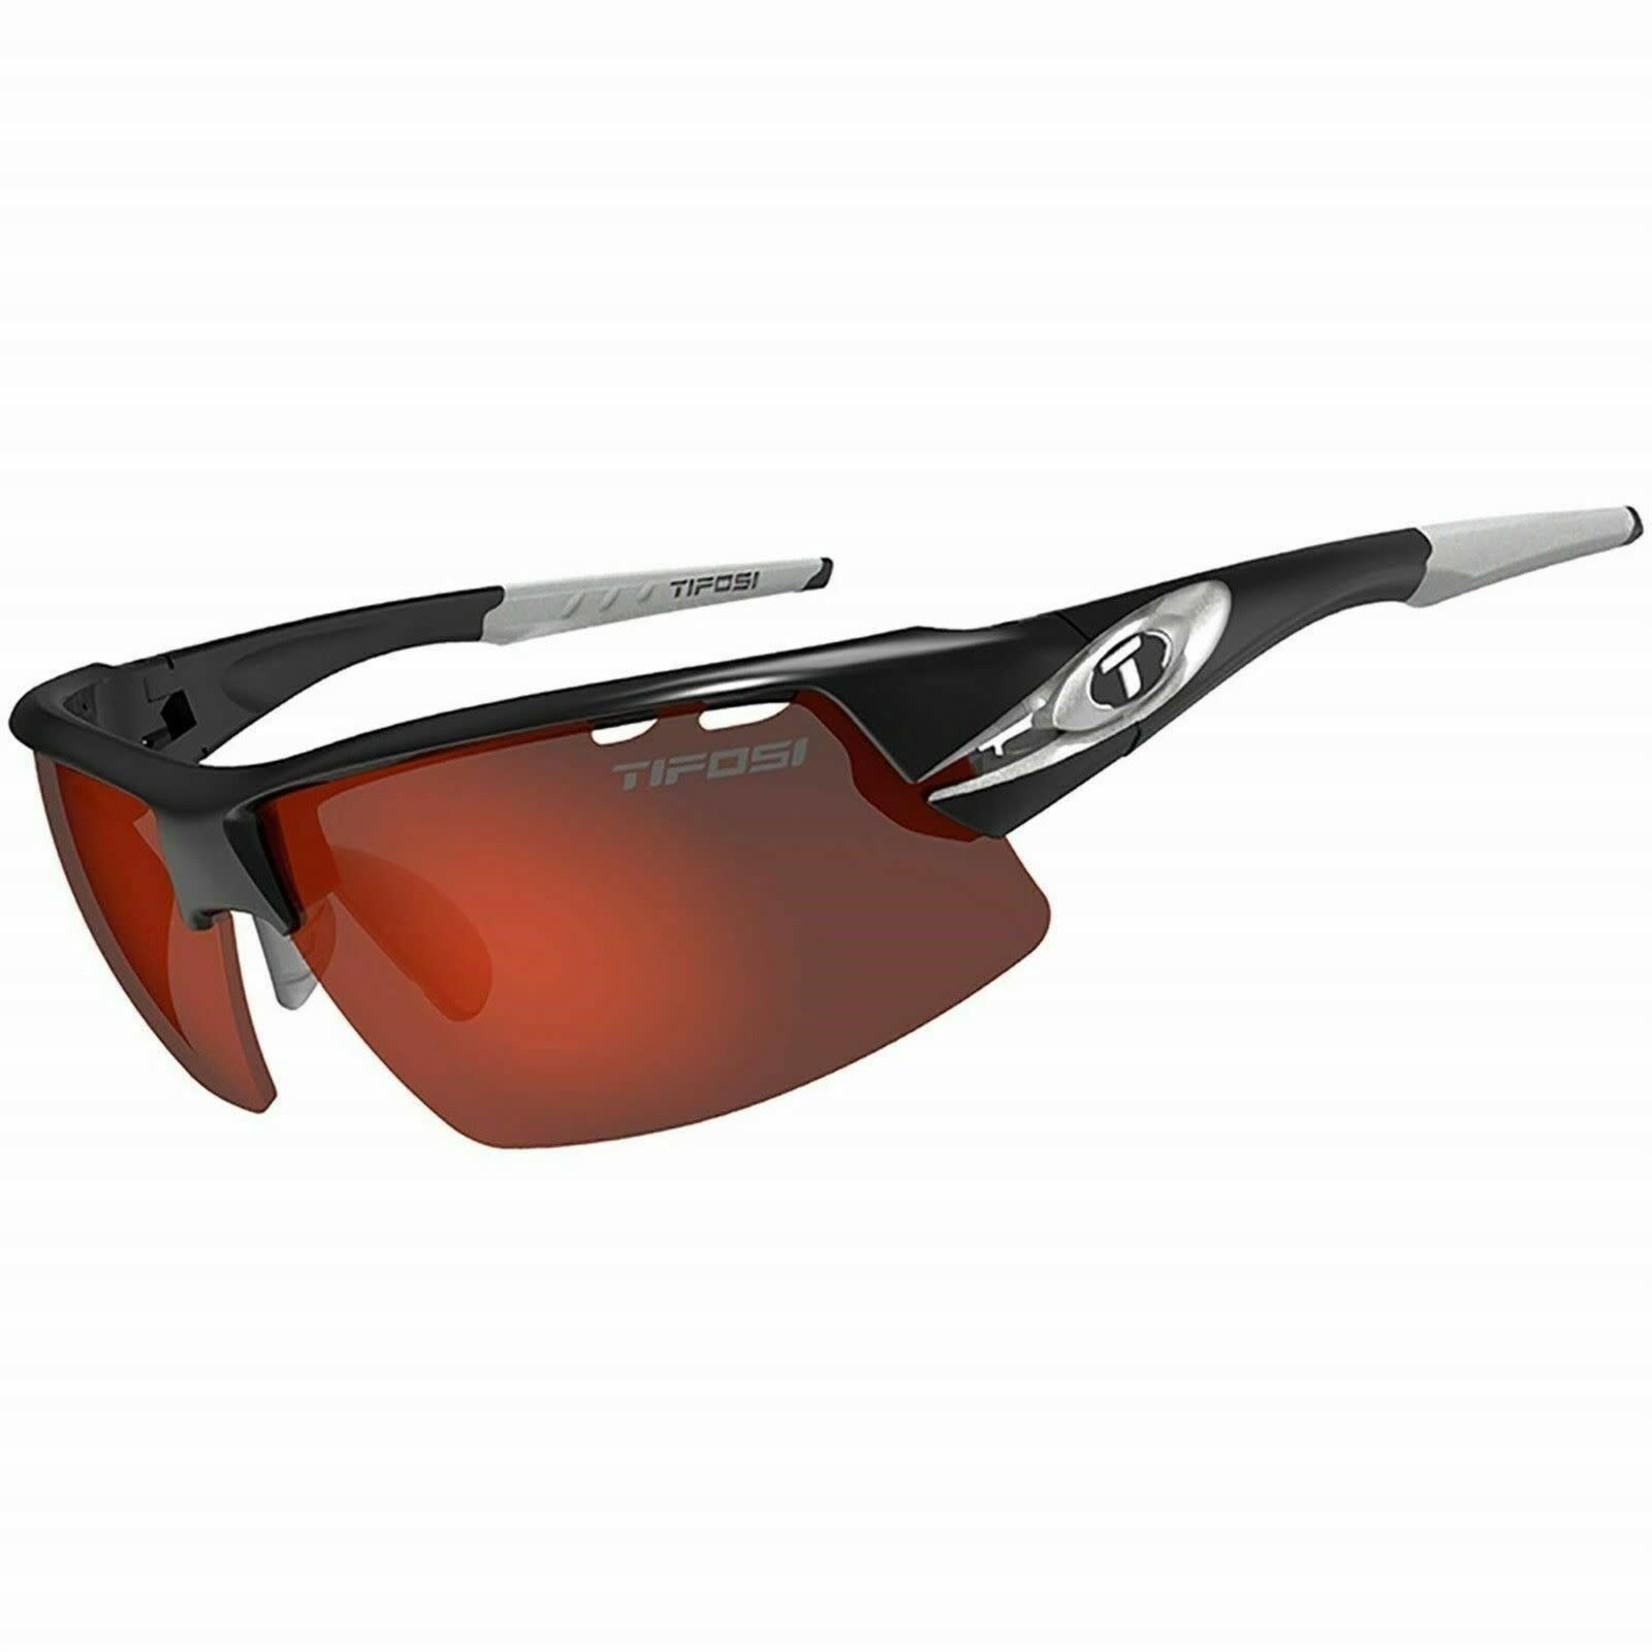 Tifosi Optics Crit, Race Silver Interchangeable Sunglasses